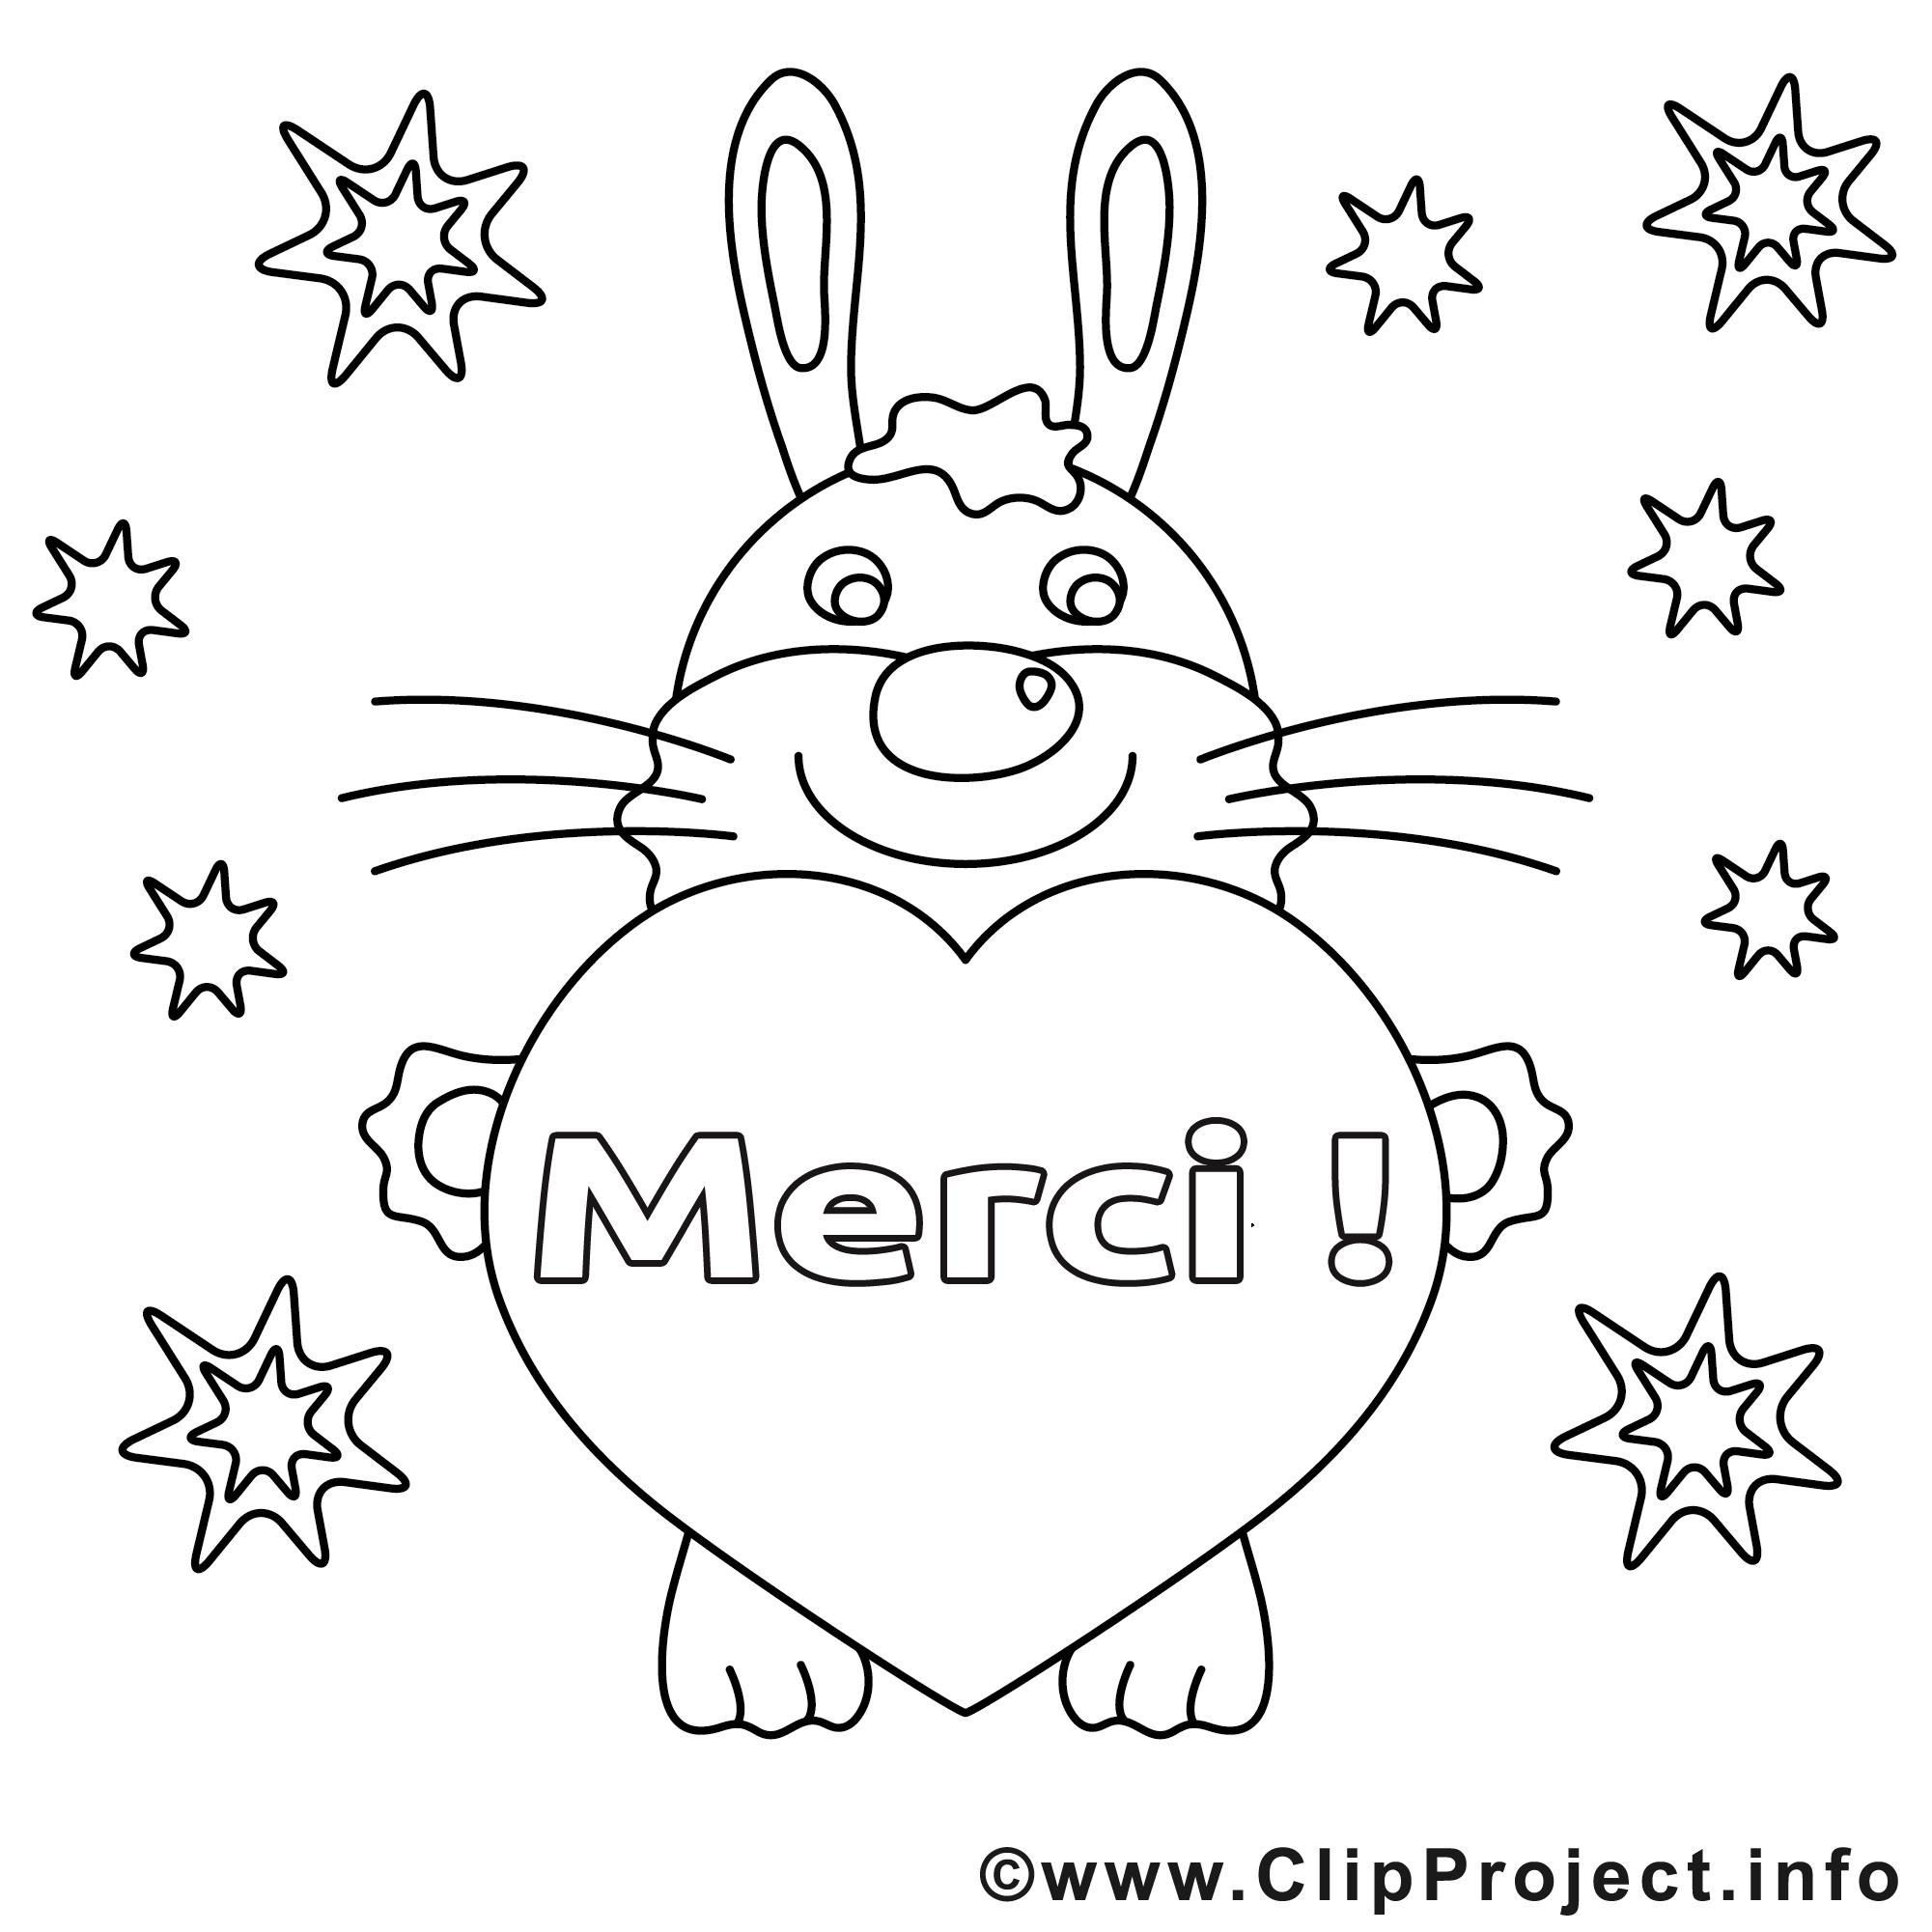 Lapin clipart merci dessins colorier merci - Dessin a colorie ...